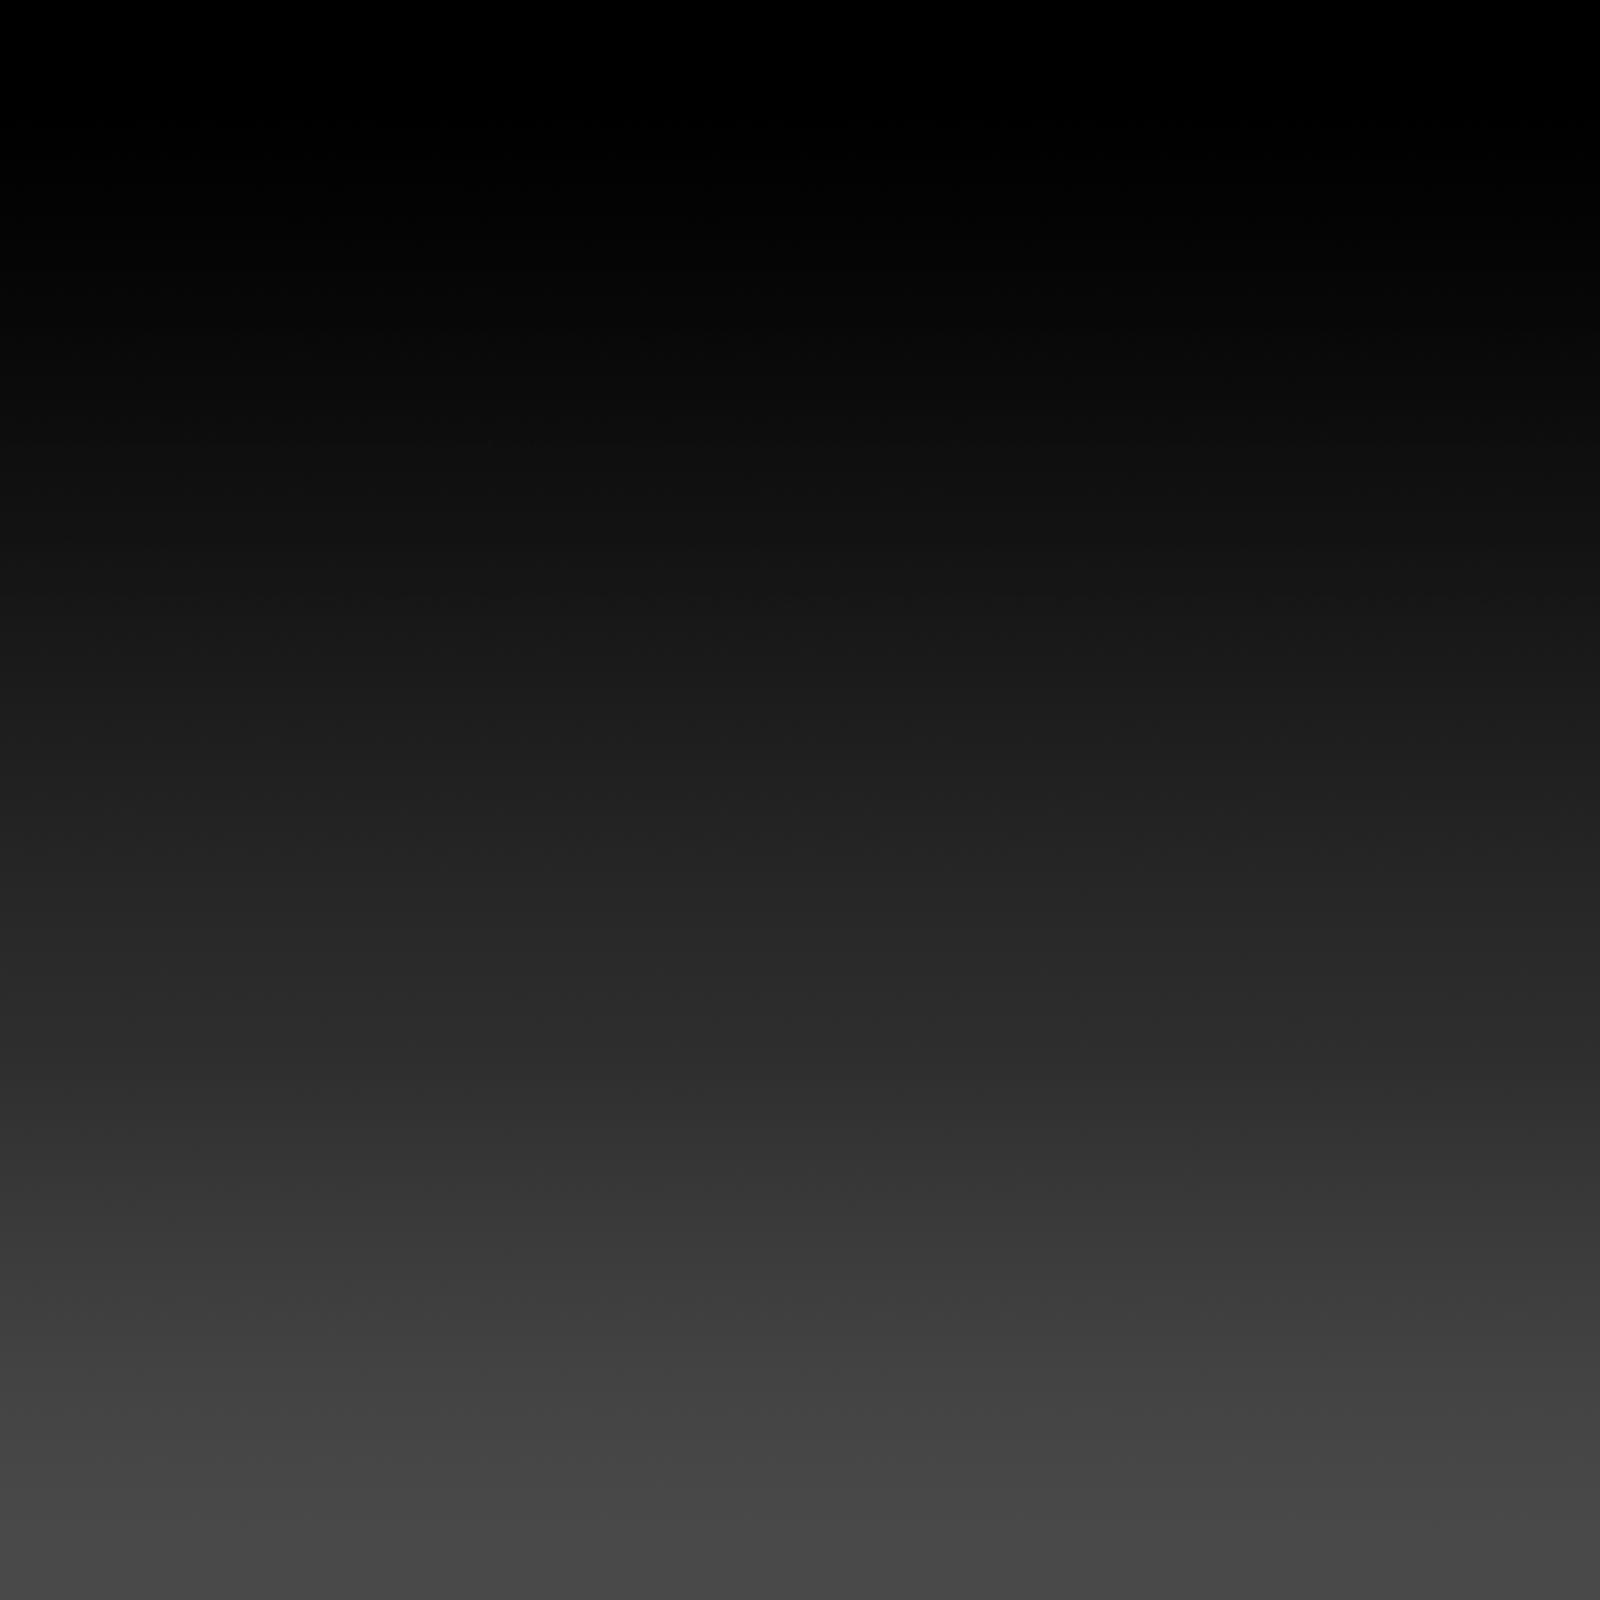 Image Result For Gradient Black Plain Wallpaper Iphone Black Wallpaper Android Wallpaper